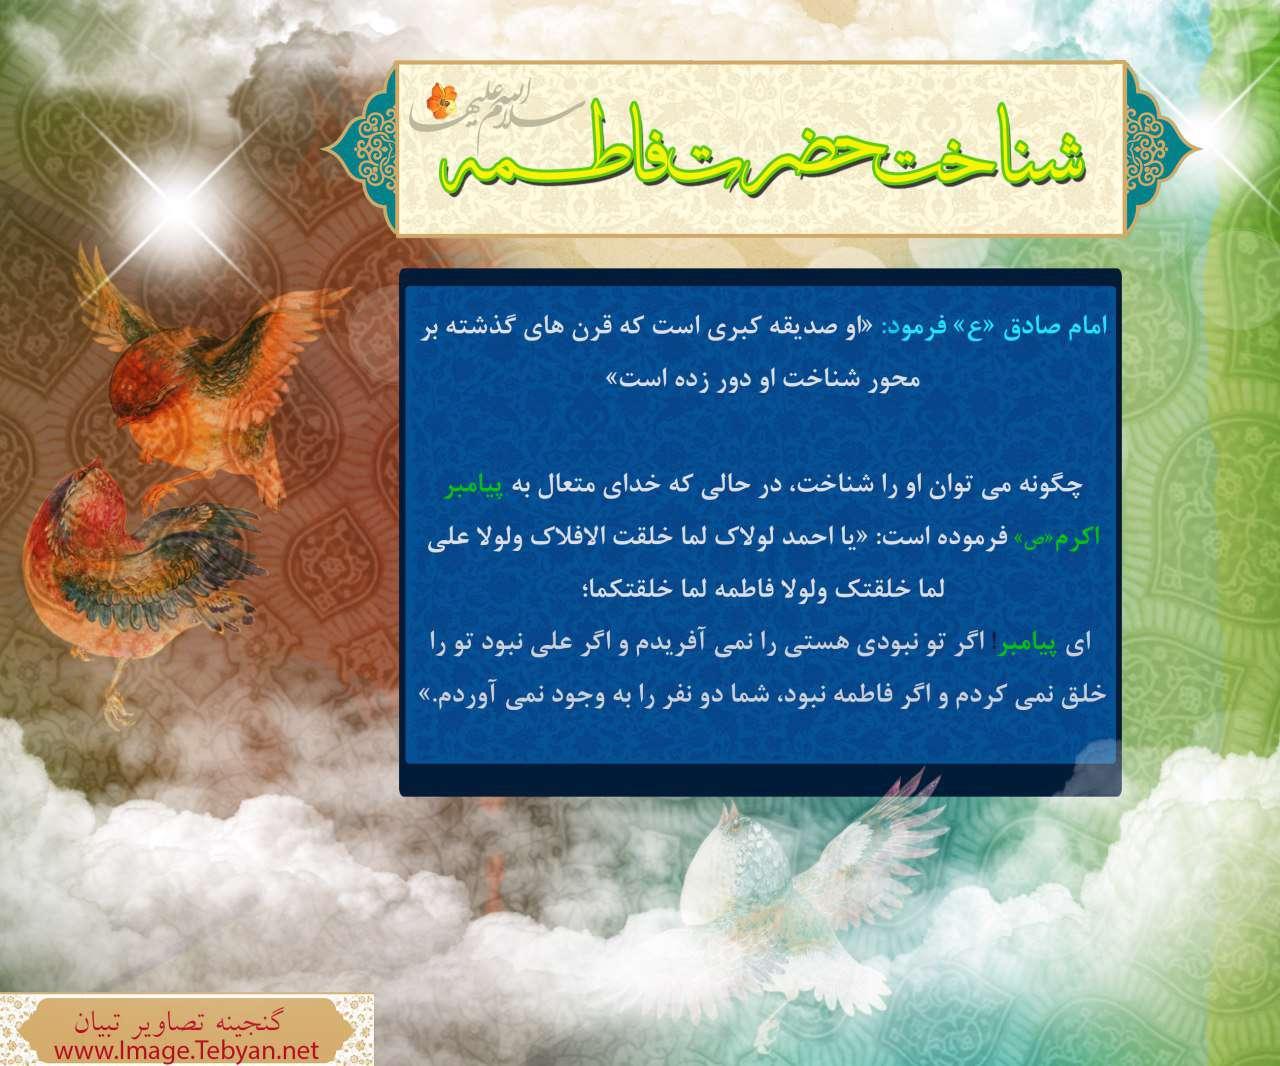 شناخت حضرت زهرا سلام الله علیها